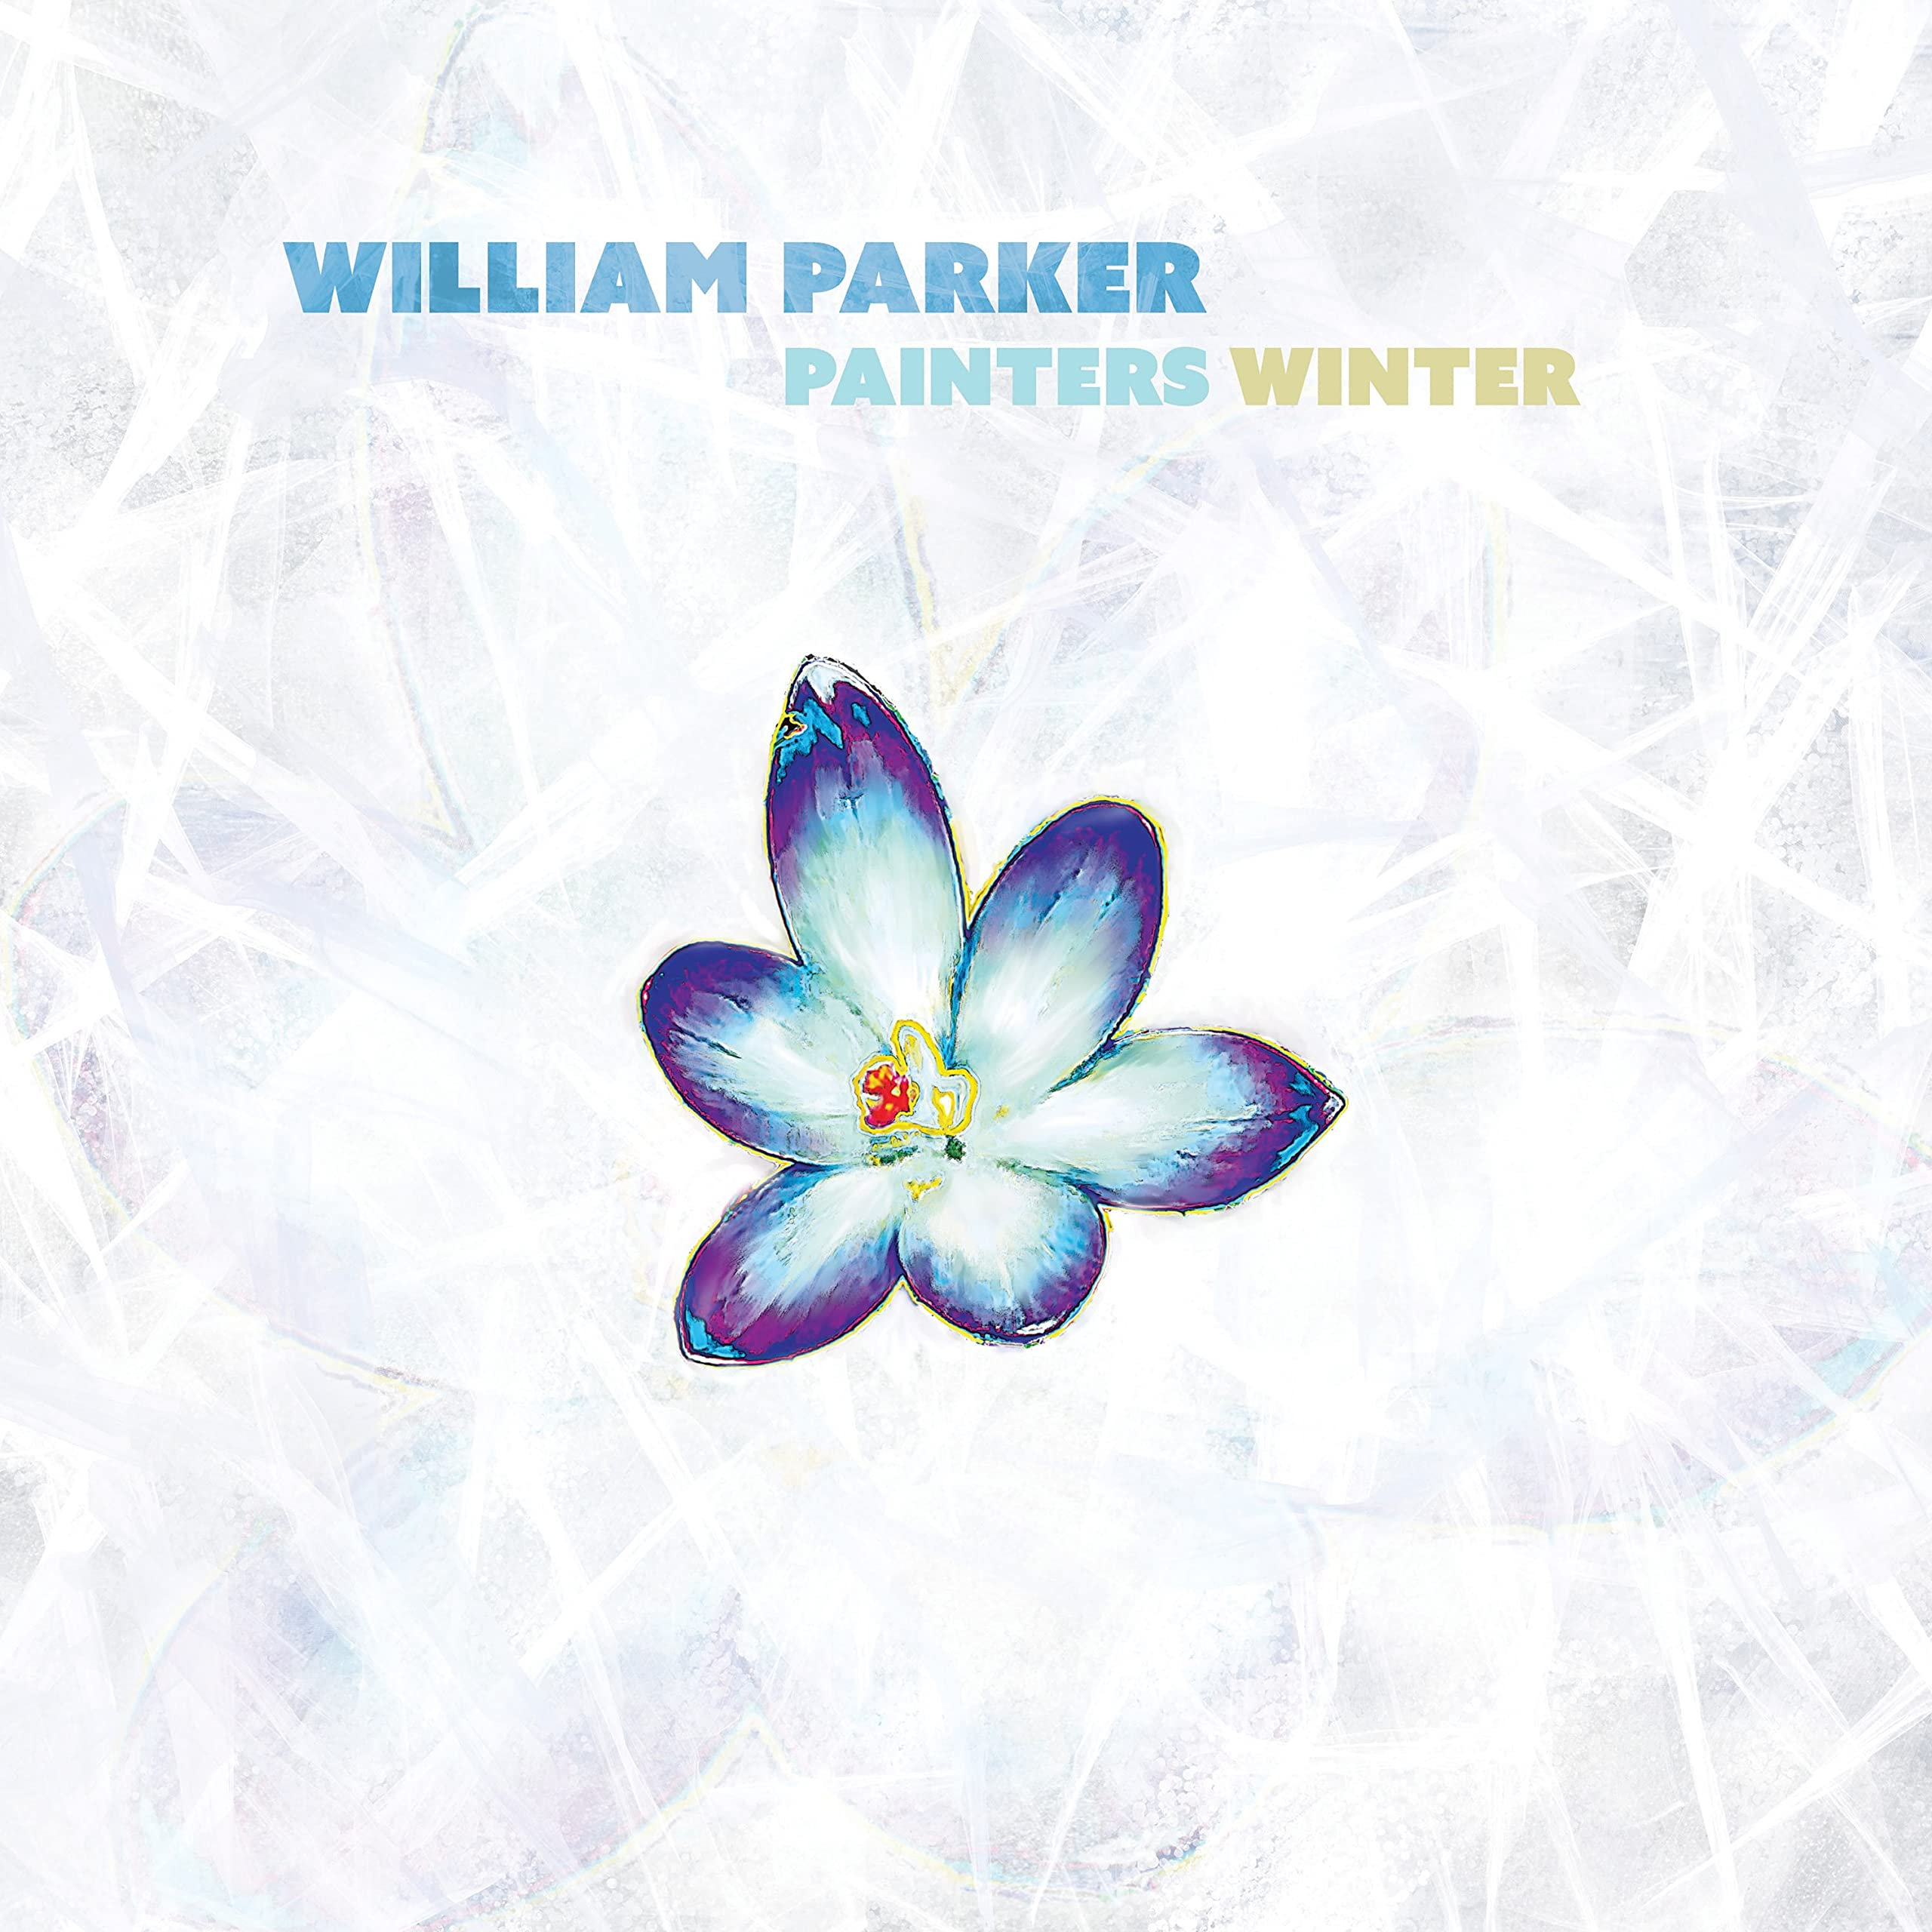 William Parker - Painters Winter (2021) [FLAC] Download